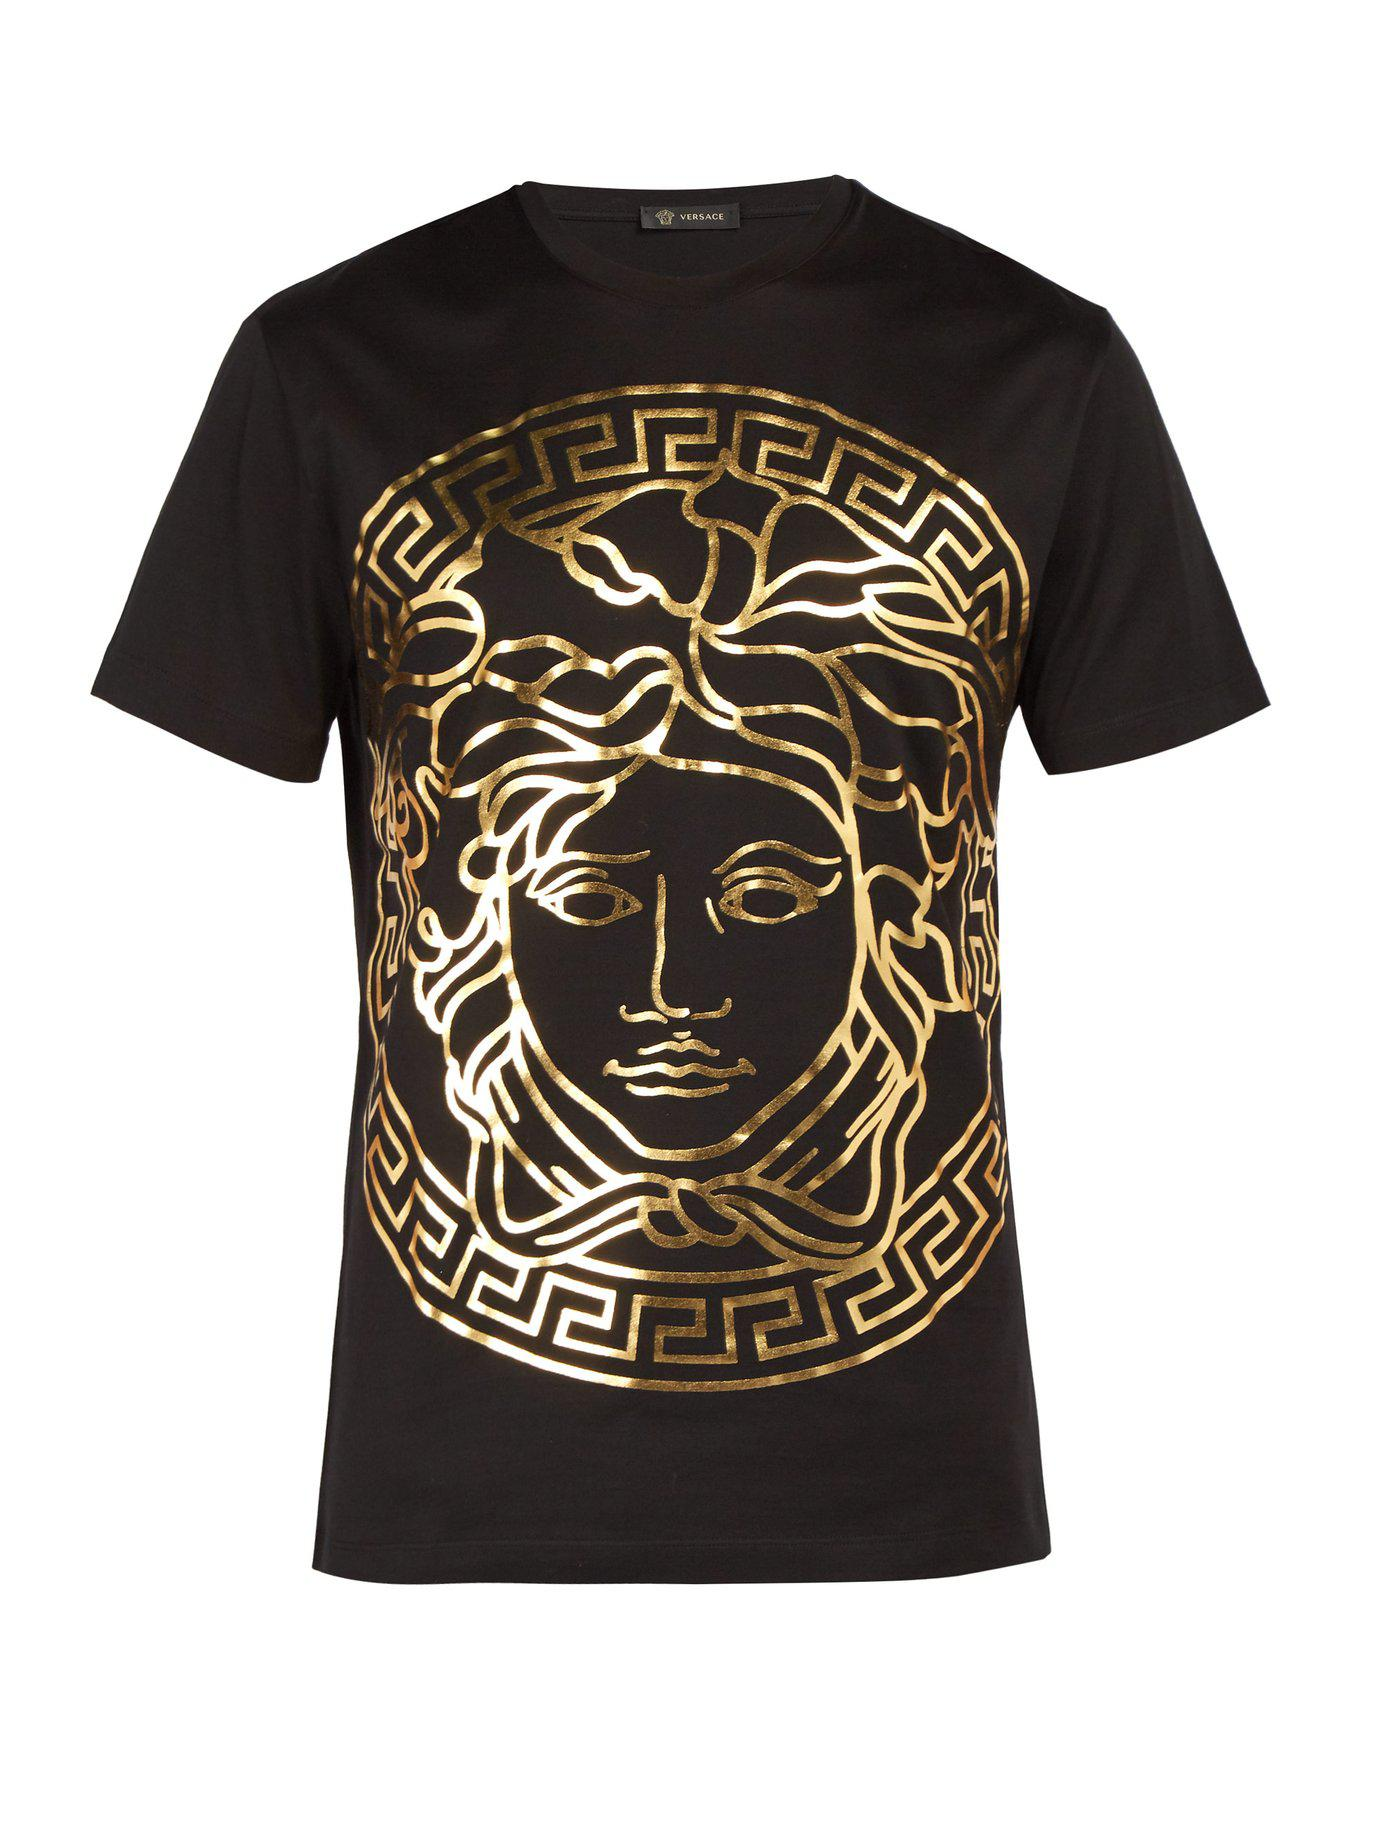 Lyst Versace Medusa Gold Print T Shirt In Black For Men Save 120